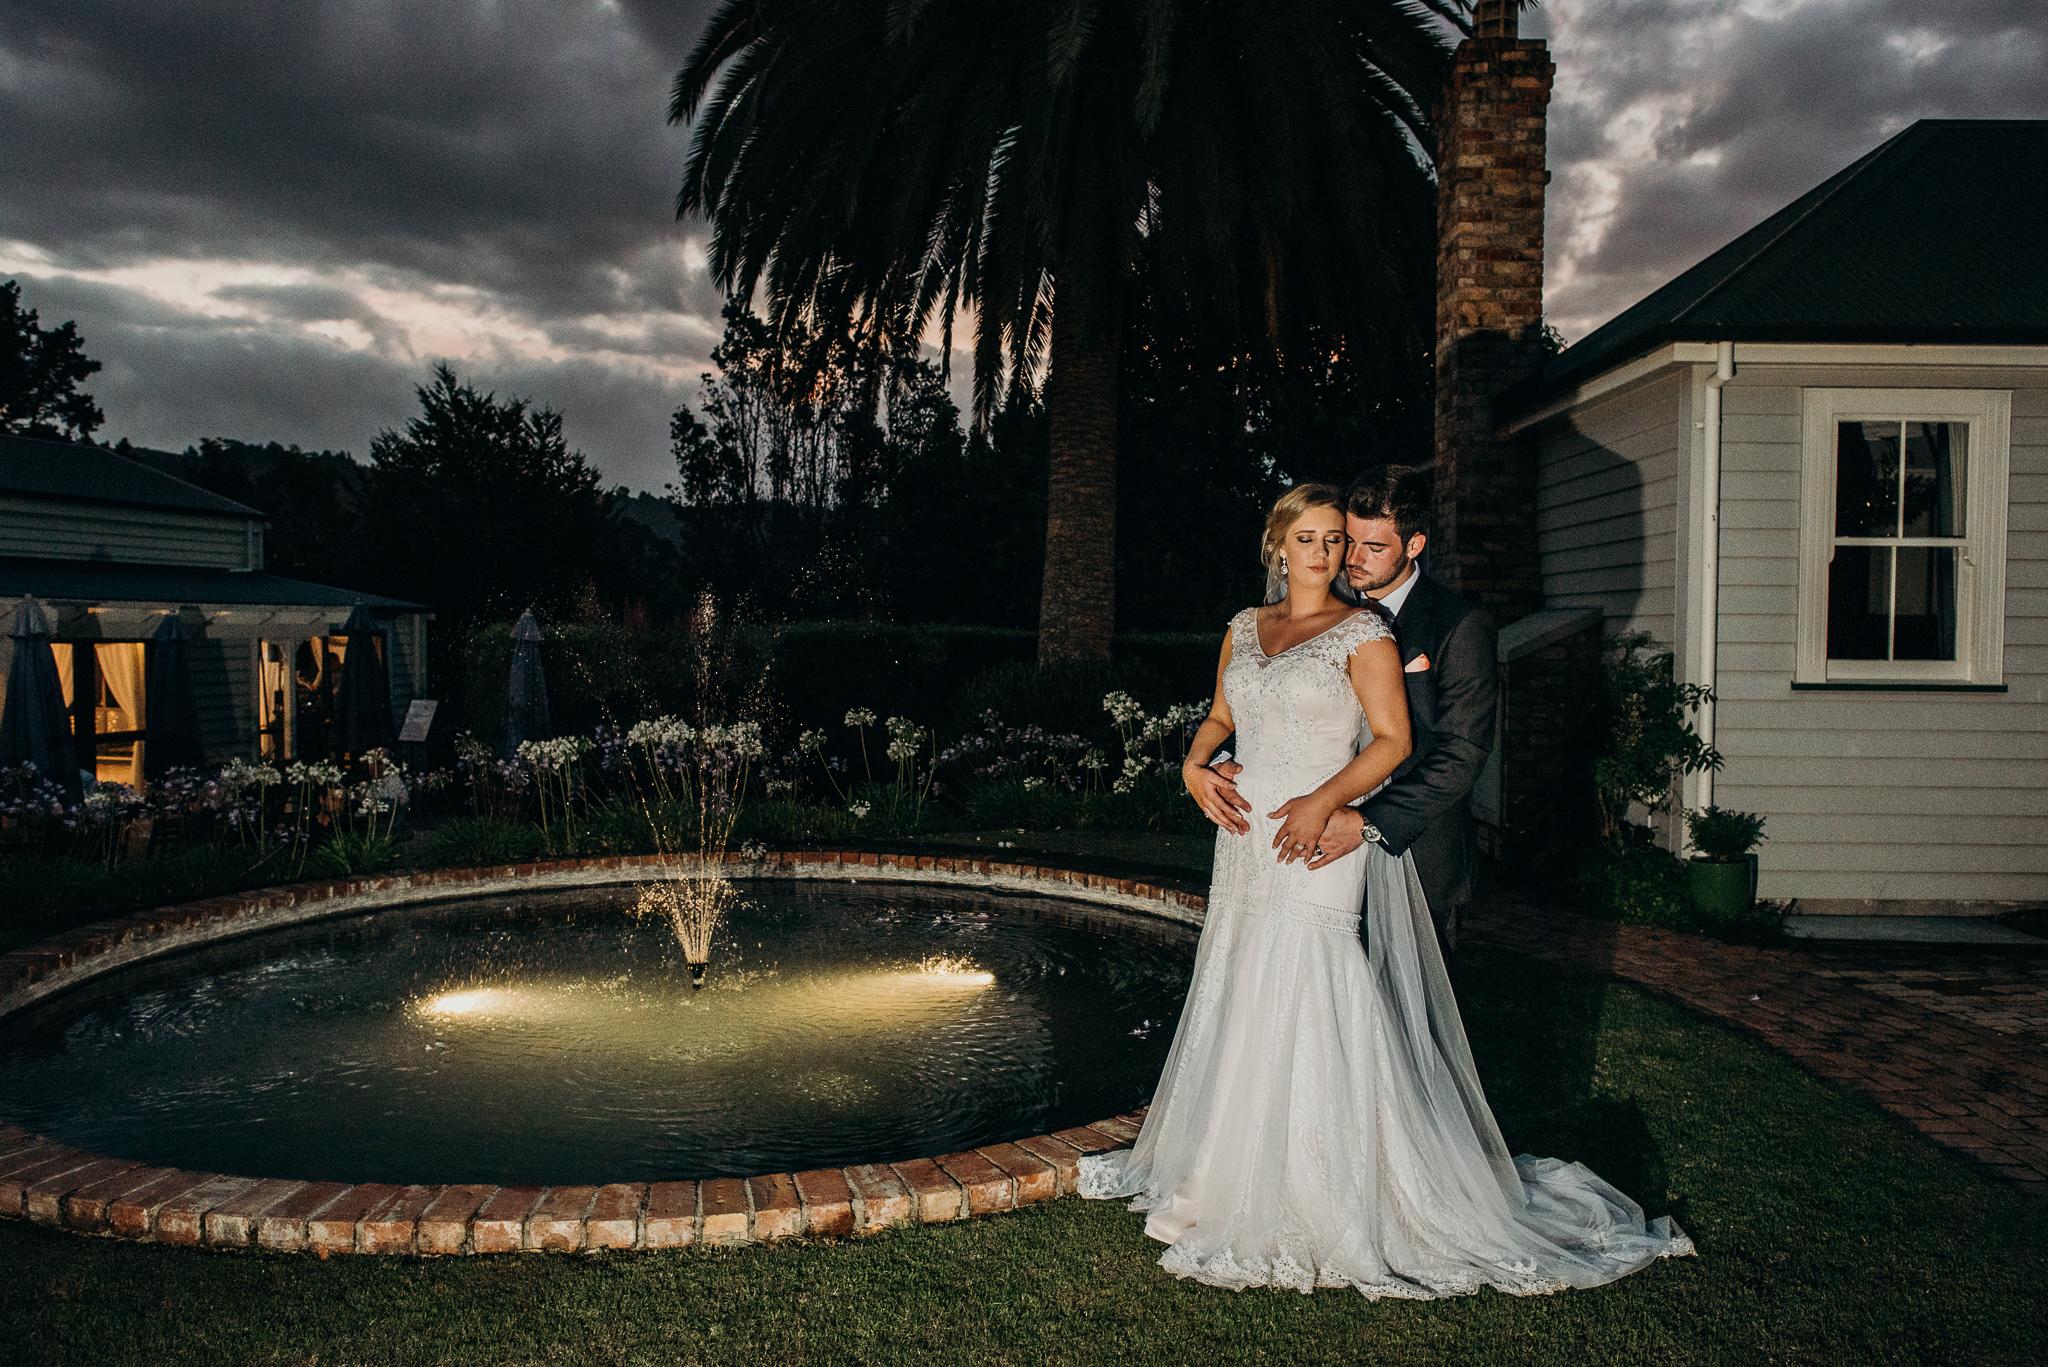 Tauranga-Coromandel-Elegant-Wedding-Photographer-Charlemagne-Lodge-112.jpg